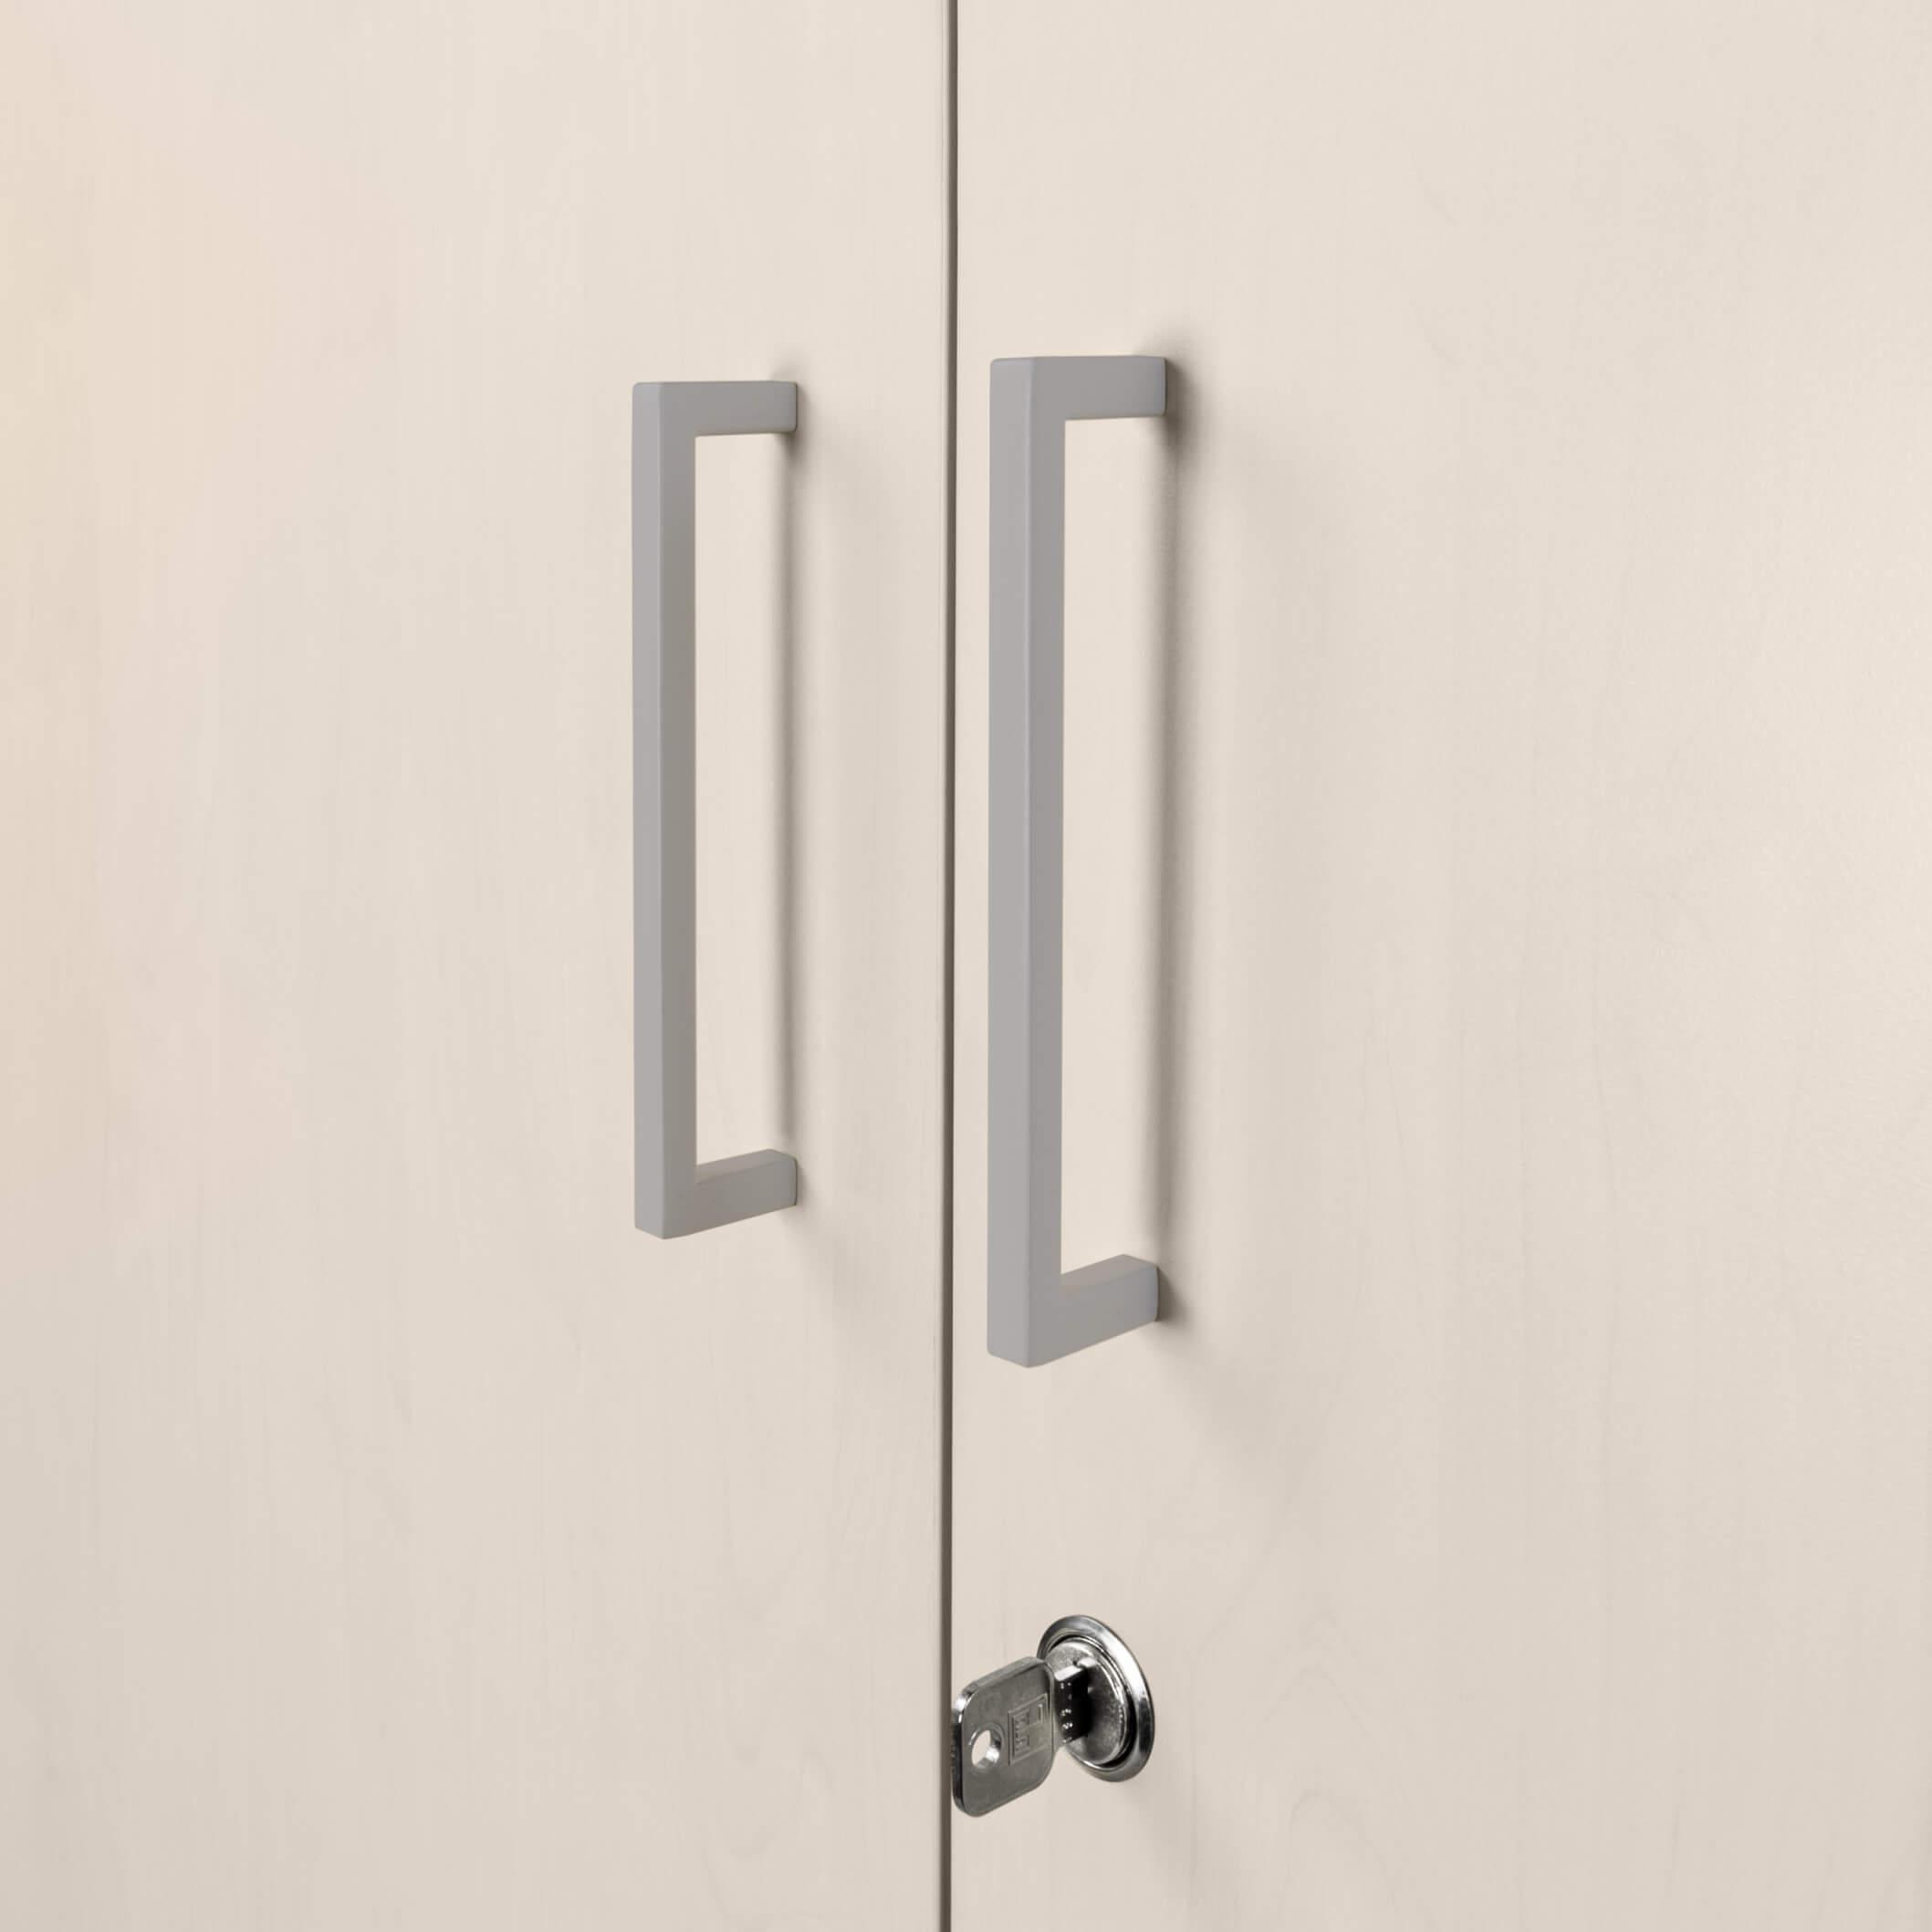 PROFI Vitrinenschrank abschließbar 5 OH Ahorn Schrank Büroschrank Flügeltürenschrank